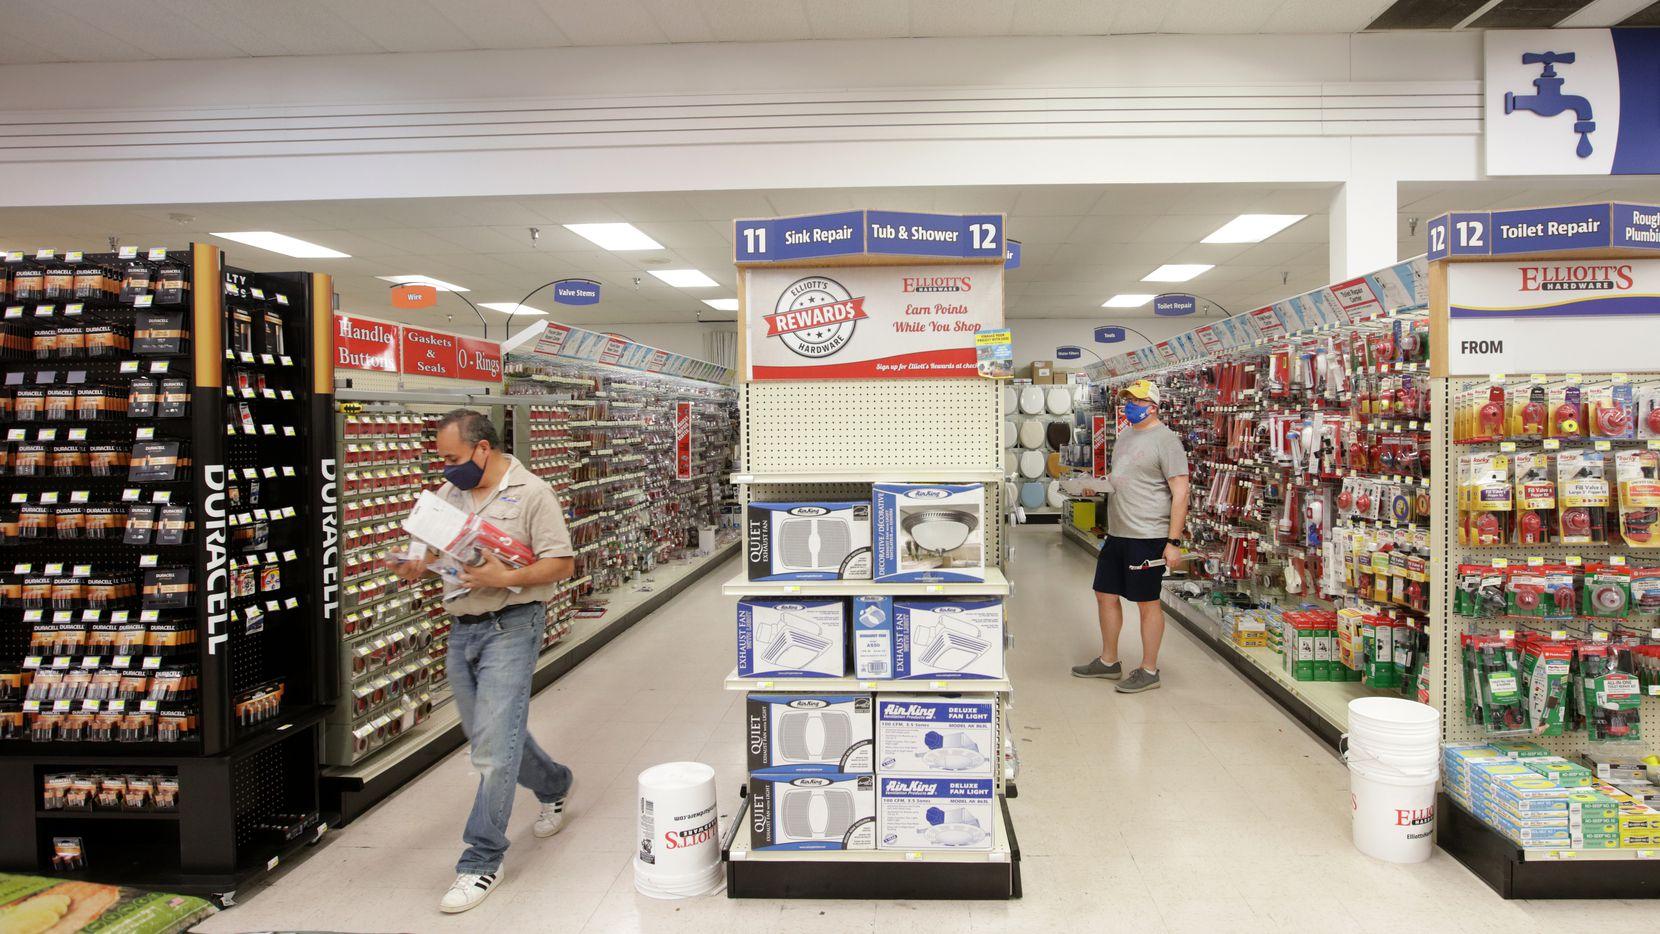 Customers shop at Elliott's Hardware in Plano, TX, on Mar. 27, 2021.